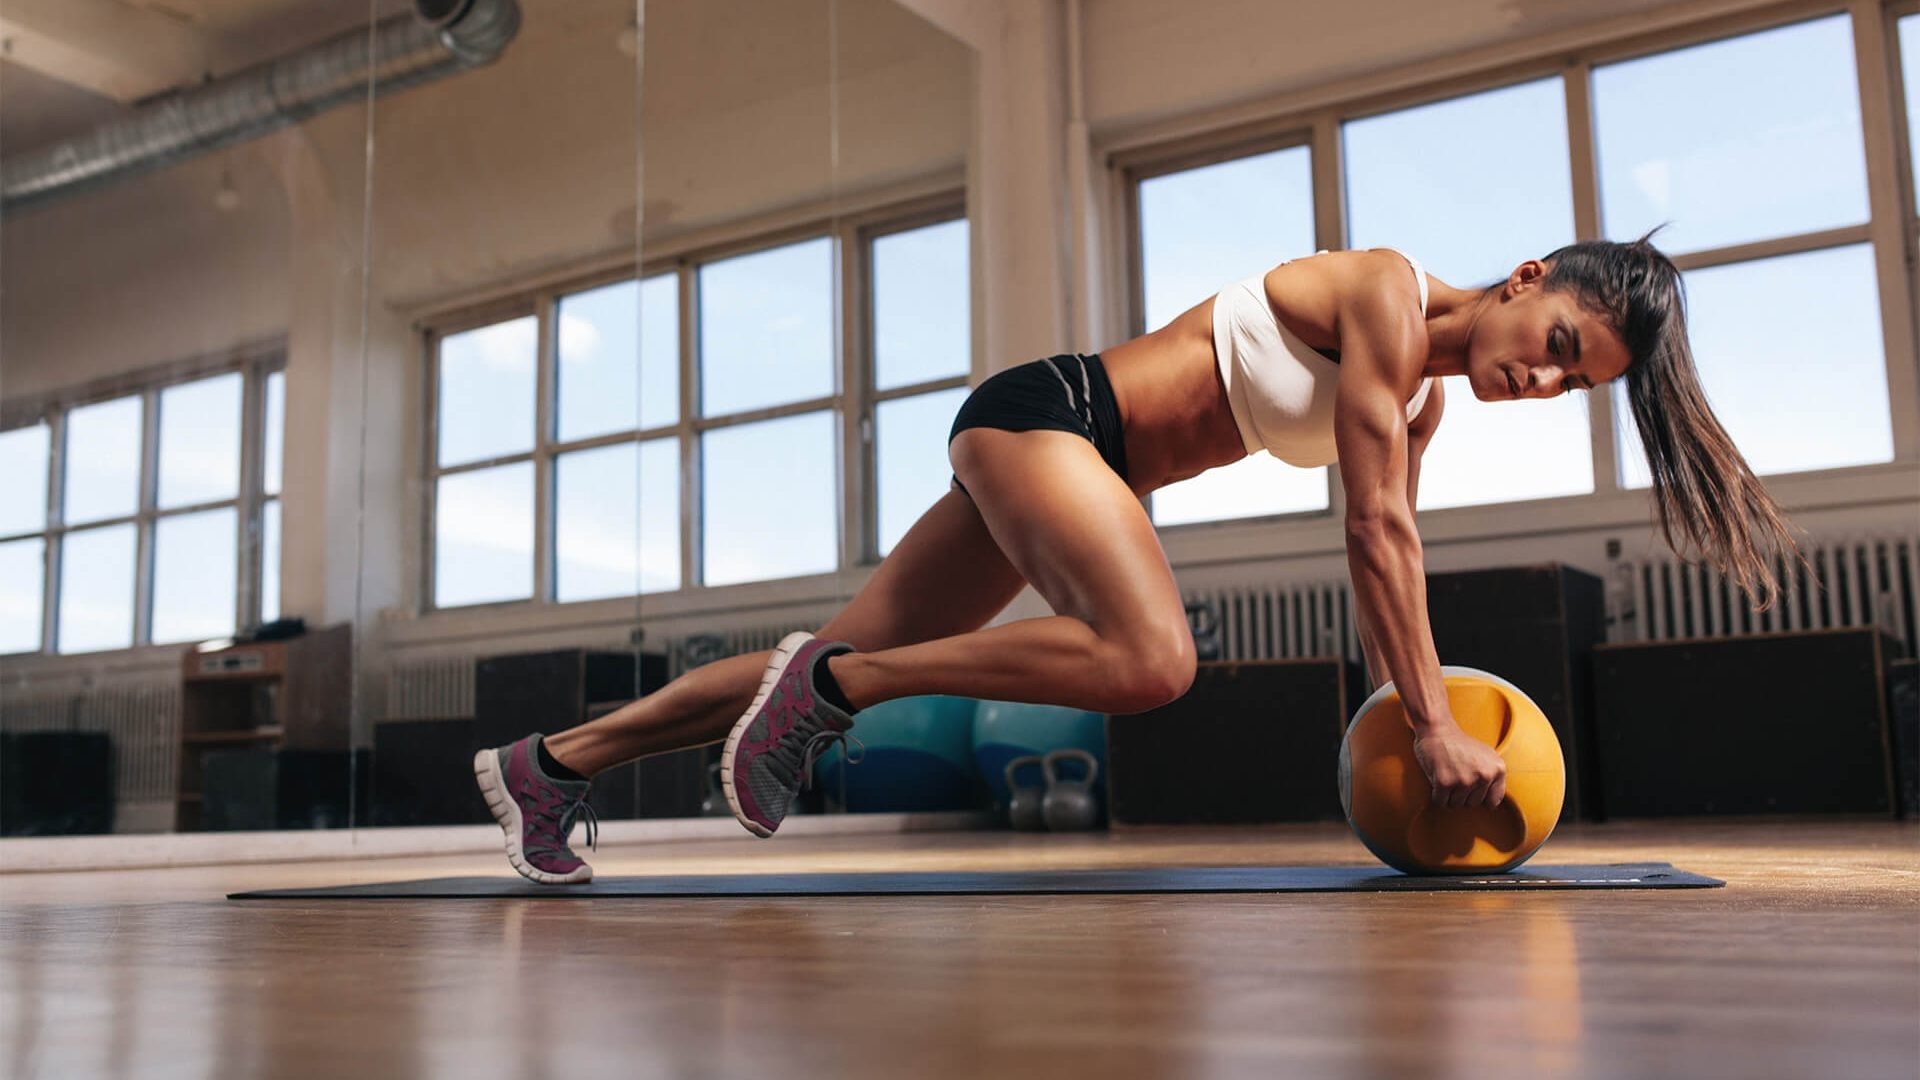 Fitness free image